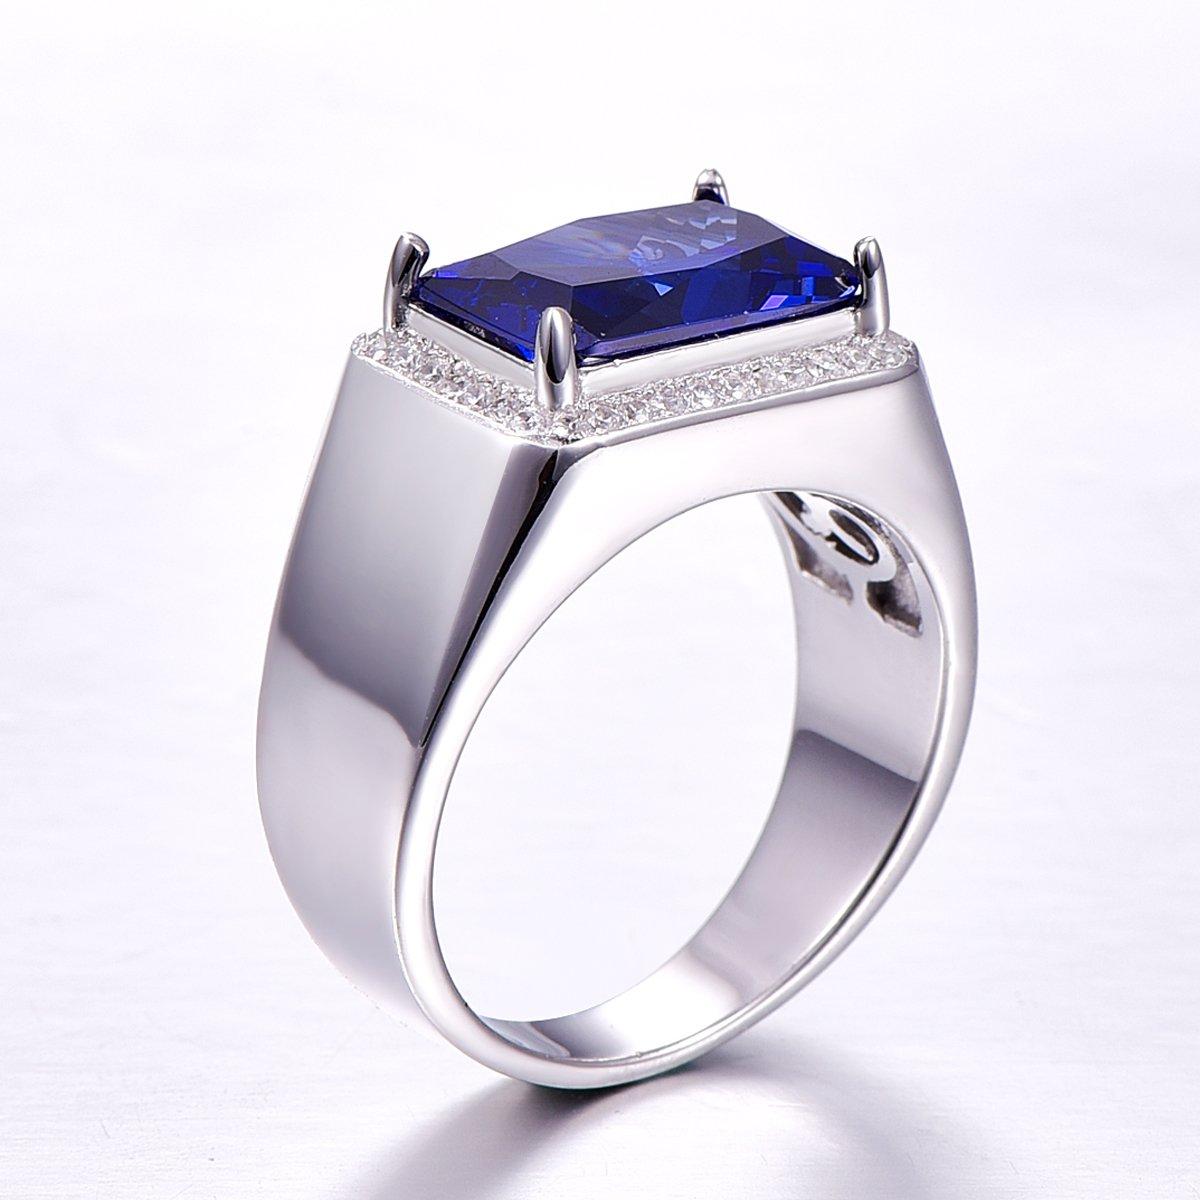 BONLAVIE 7.0ct Square Created Blue Sapphire 925 Sterling Silver Men's Ring Size 6 by BONLAVIE (Image #4)